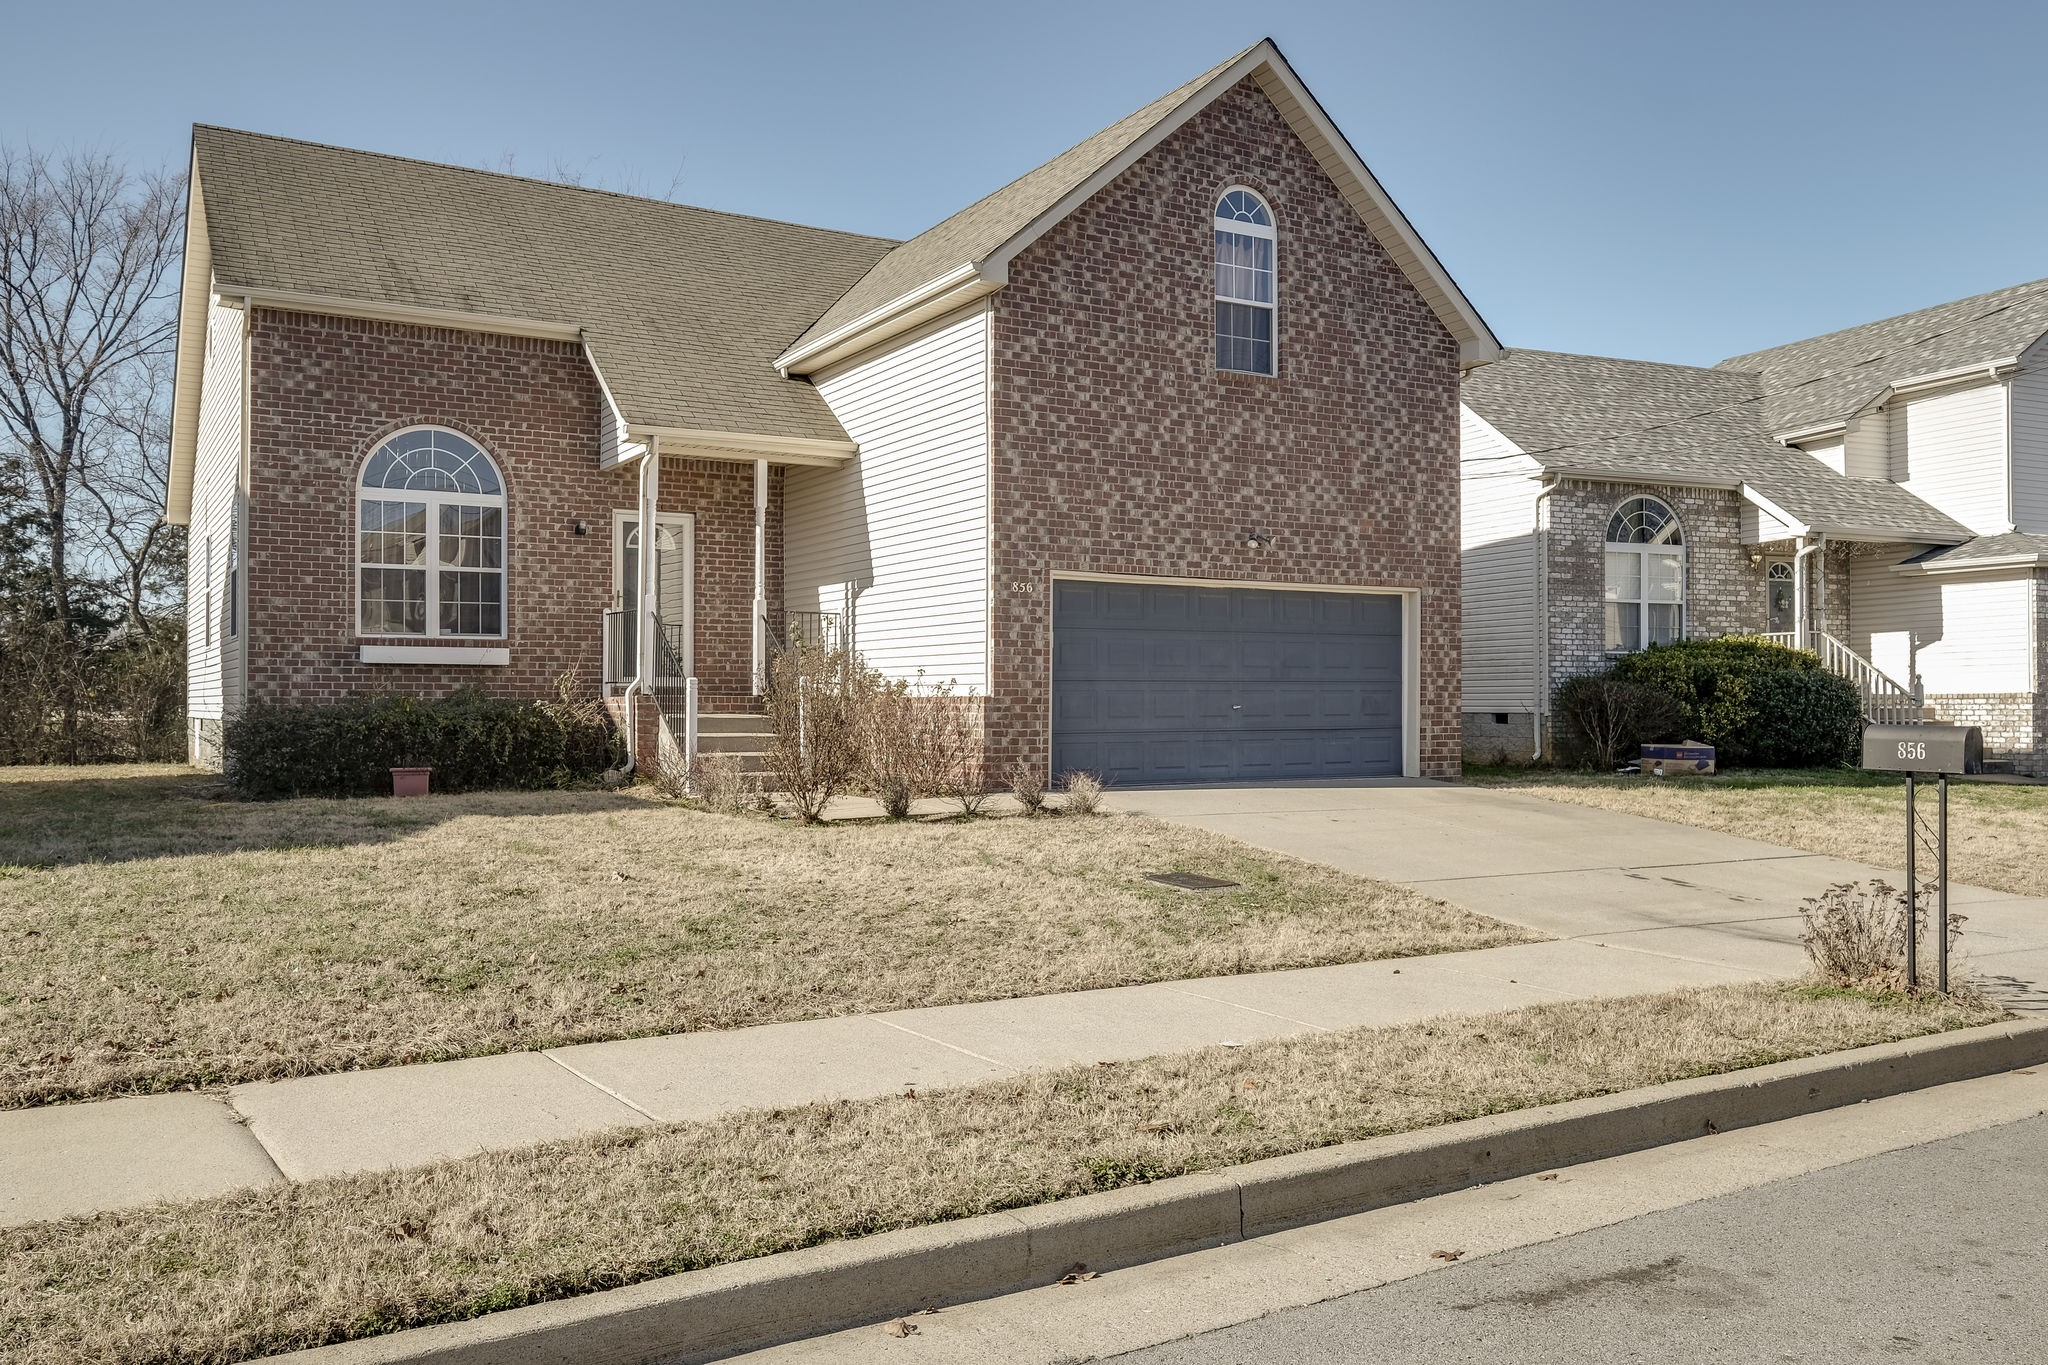 856 Pin Oak Dr, Nashville-Antioch in Davidson County, TN County, TN 37013 Home for Sale